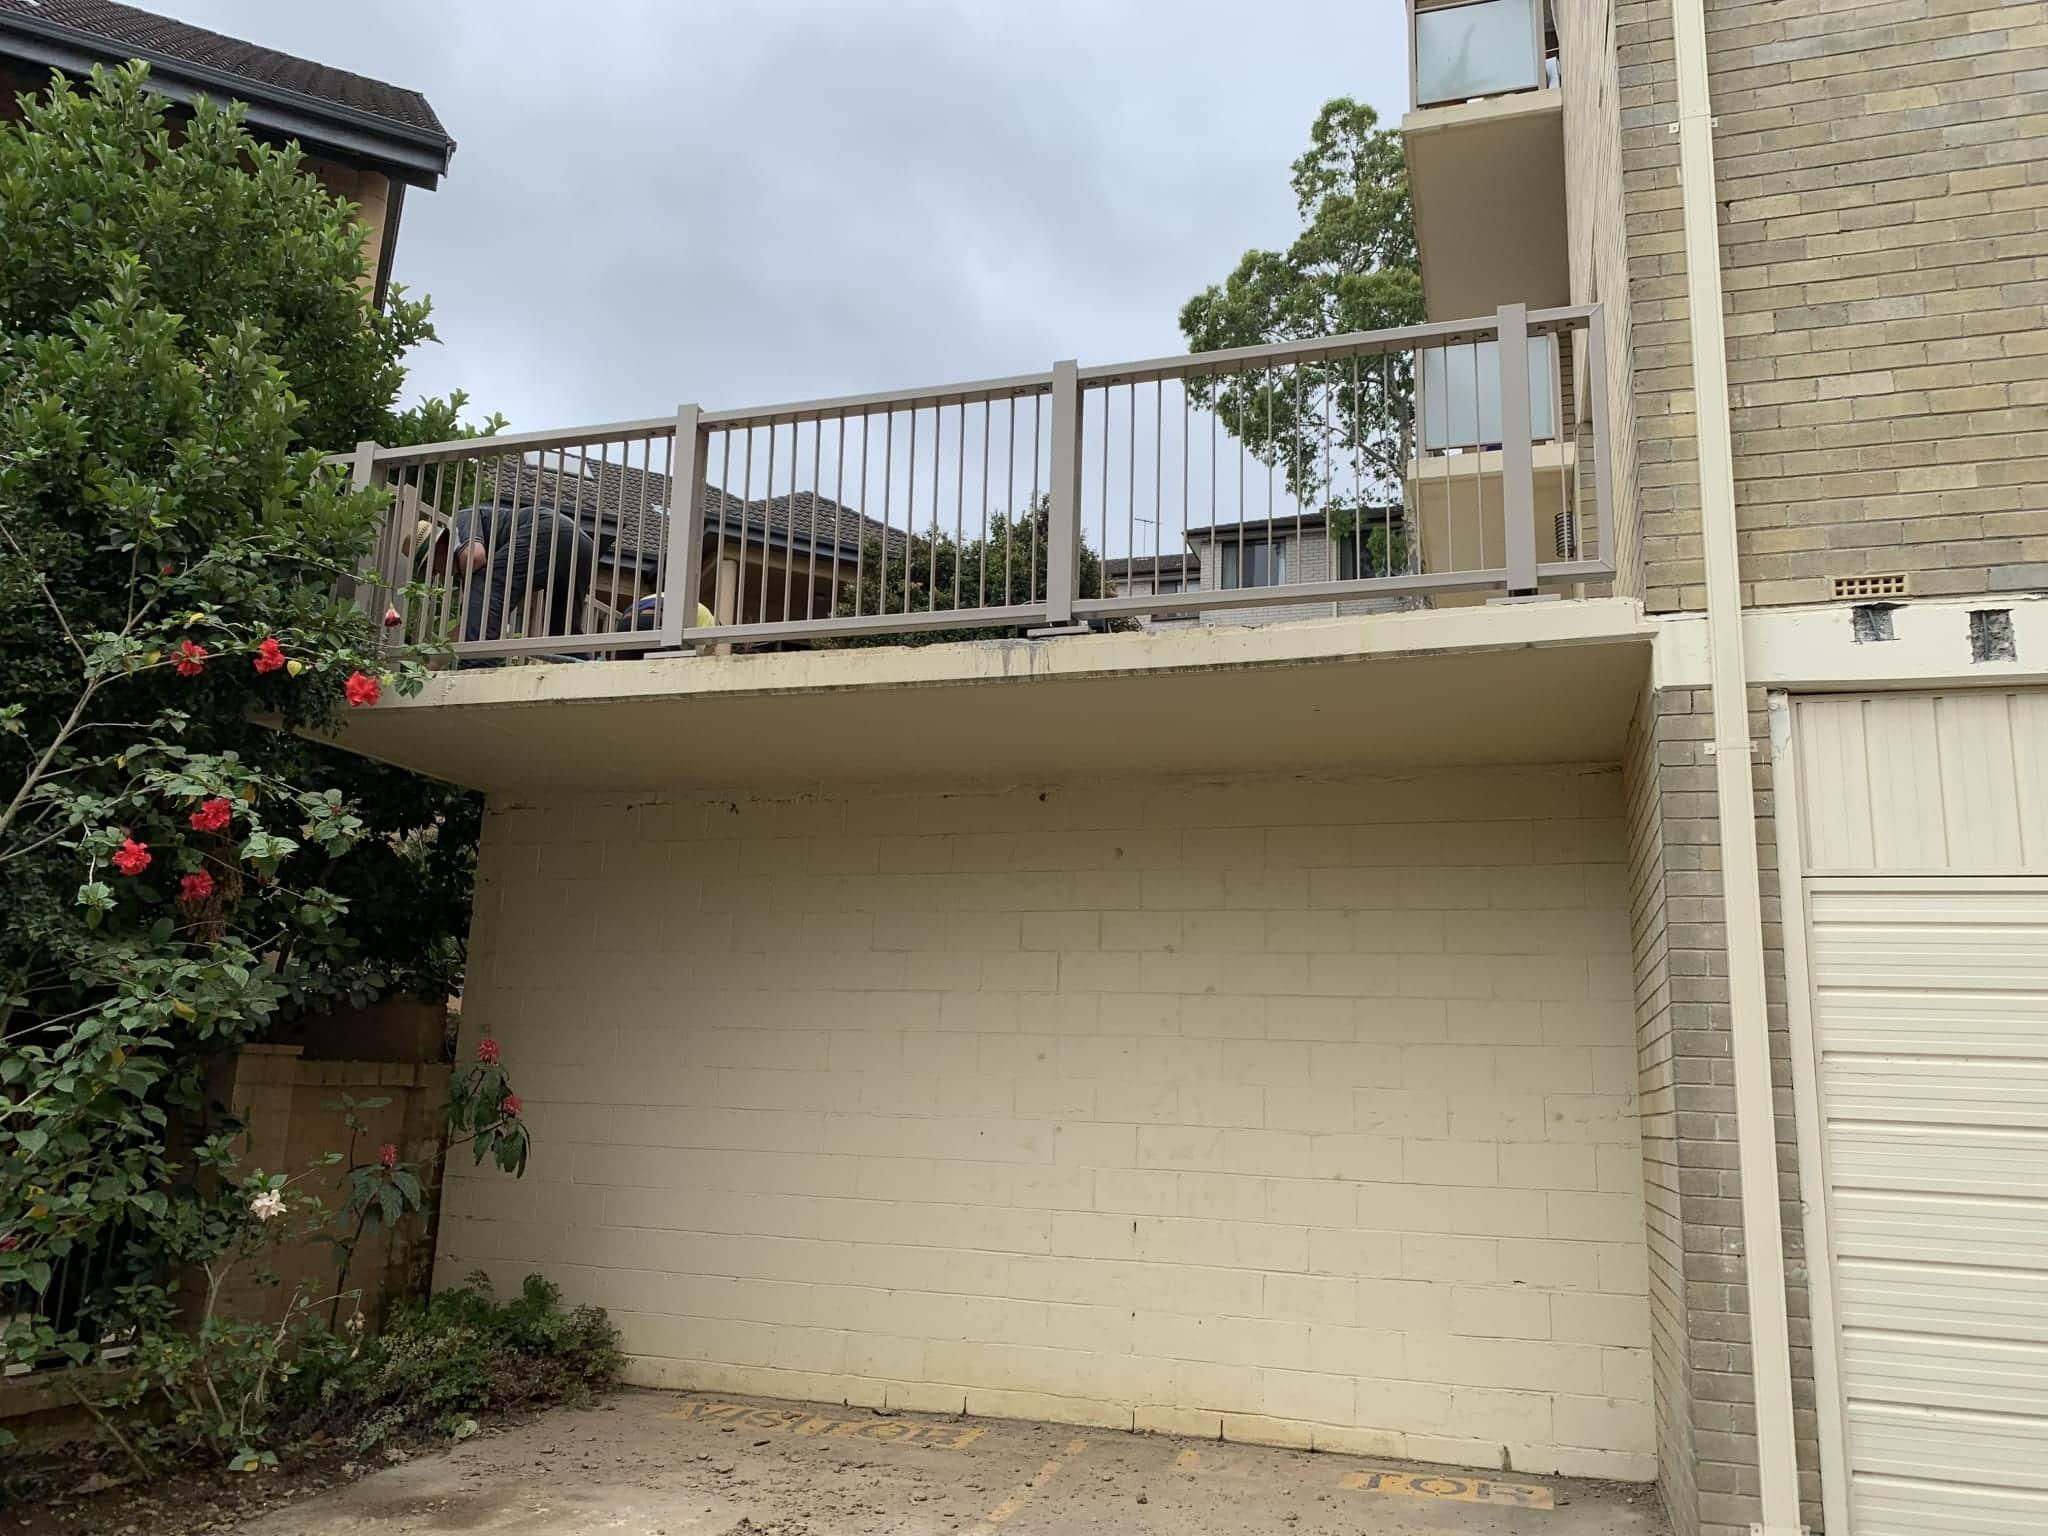 artarmon apartment complex perimeter edge protection with rhino stop elite